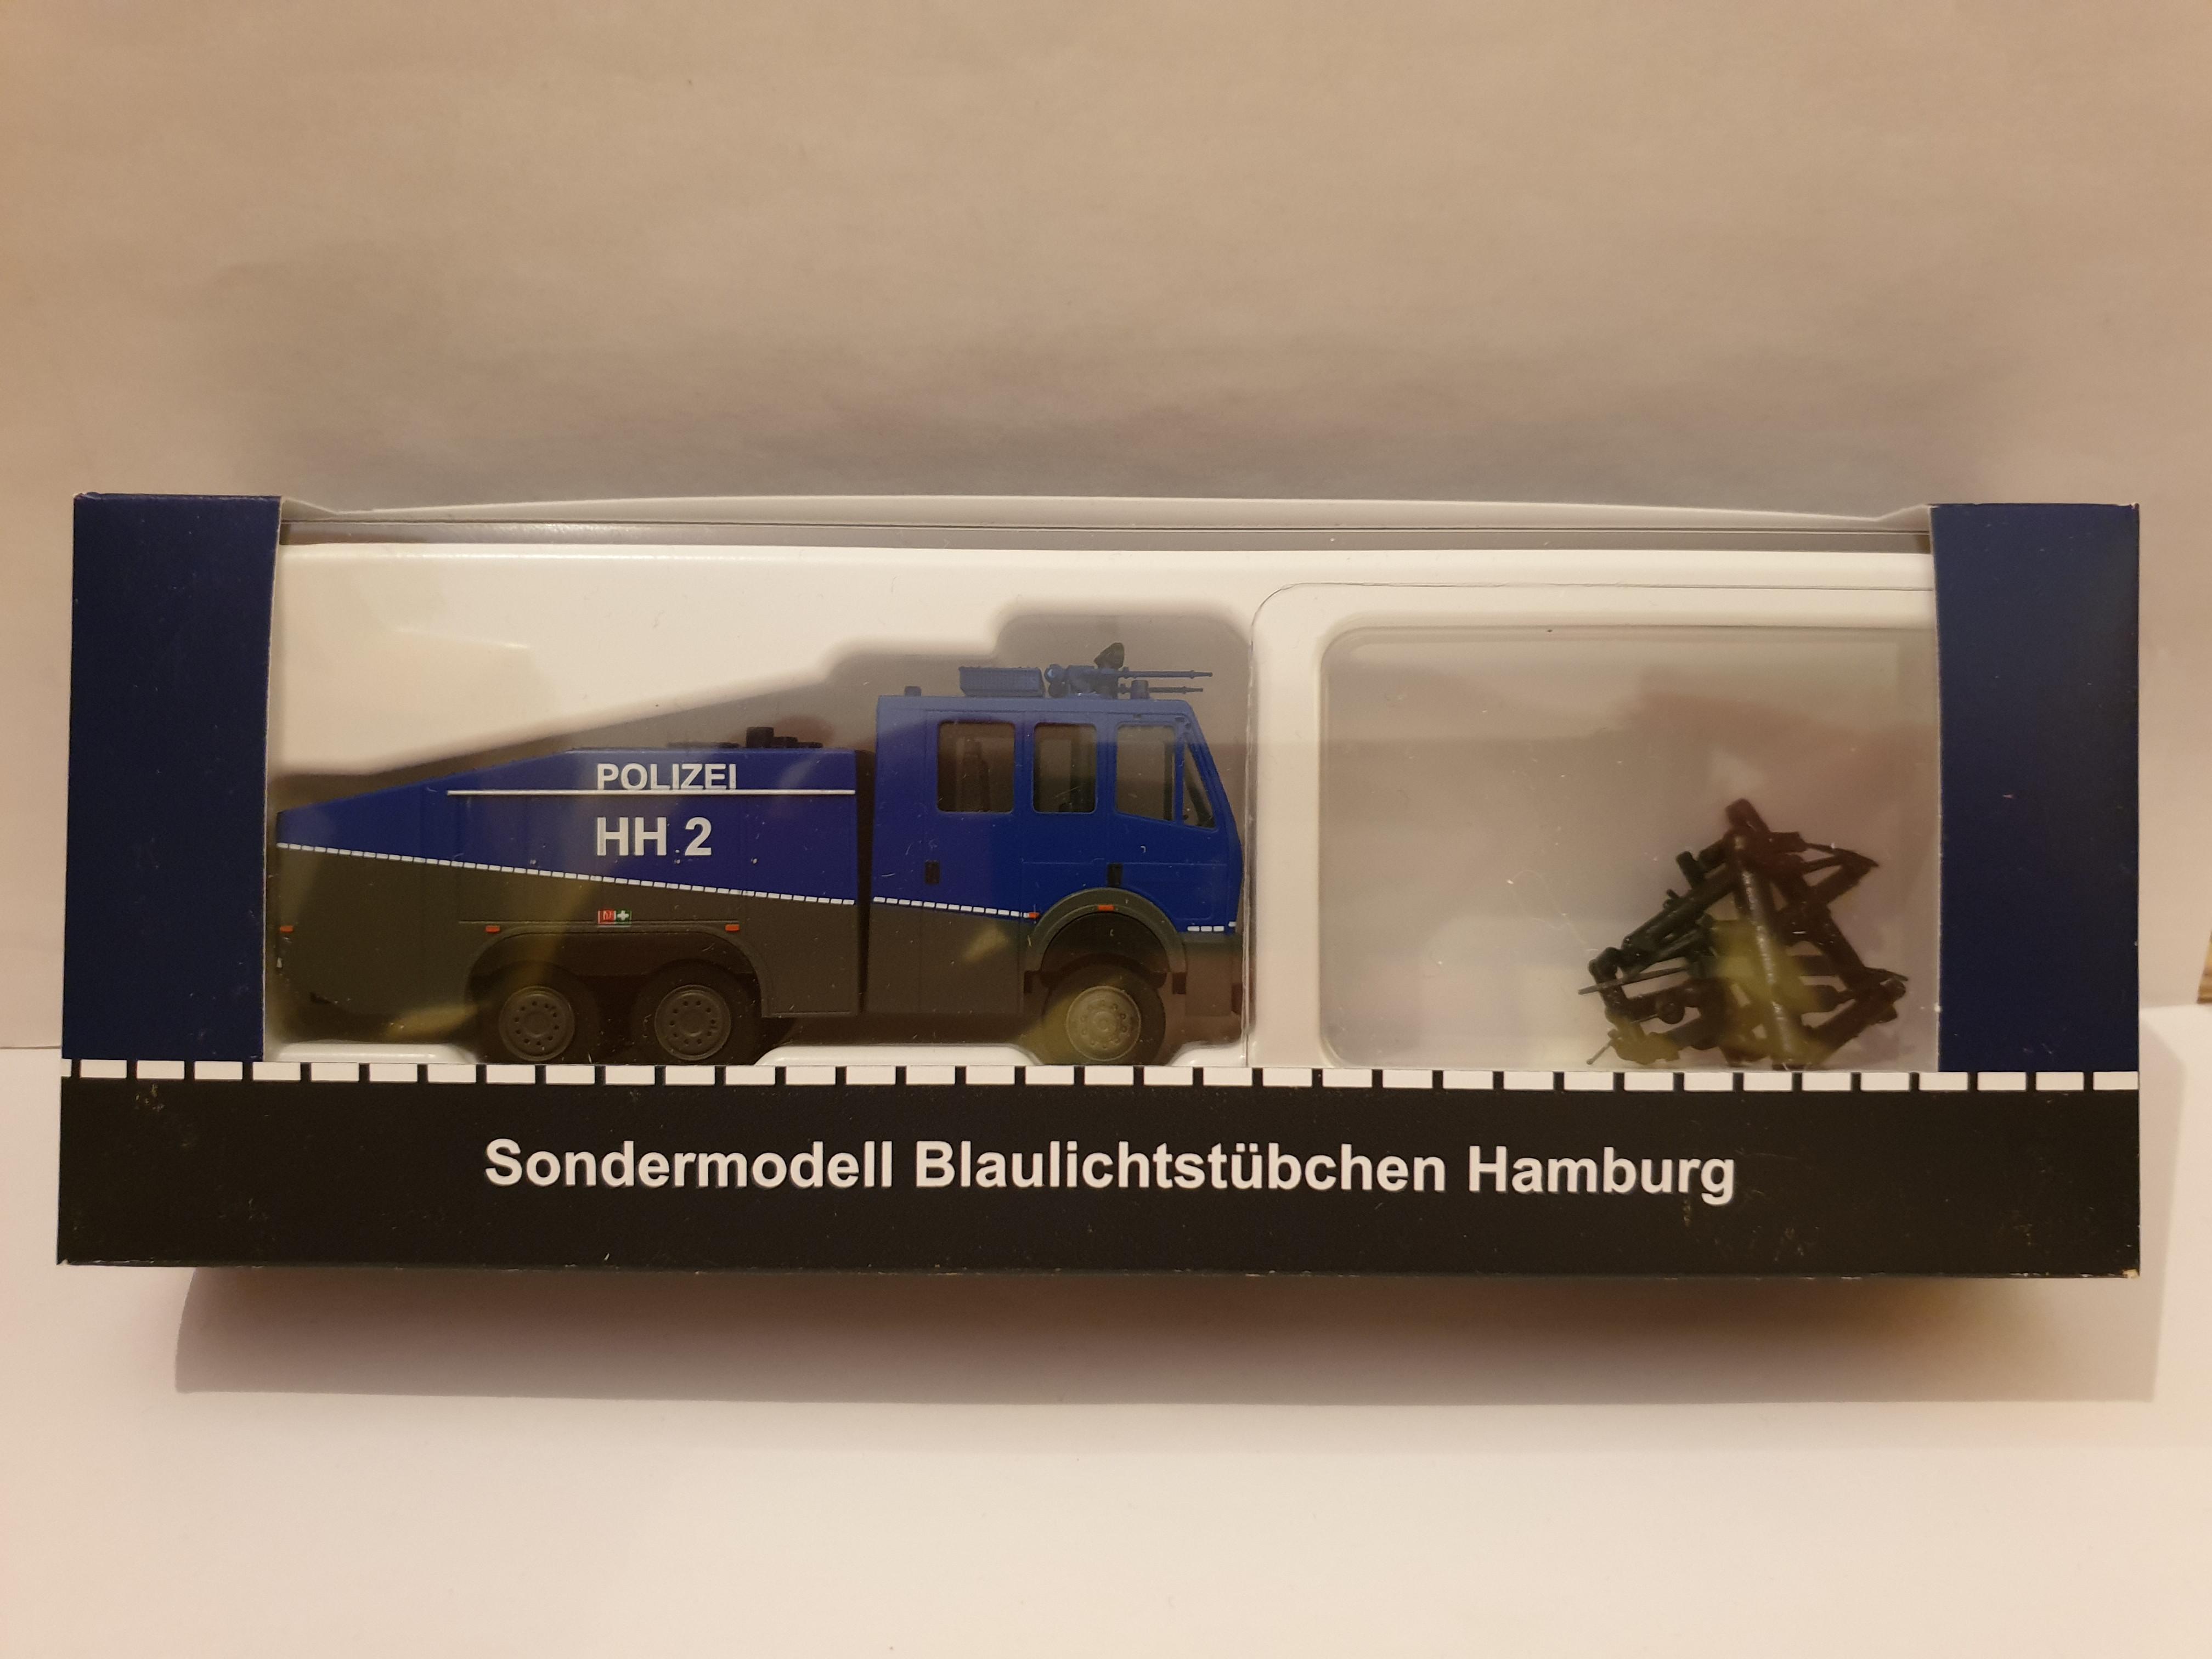 Rietze MB WaWe 9000 Polizei Hamburg HH 2